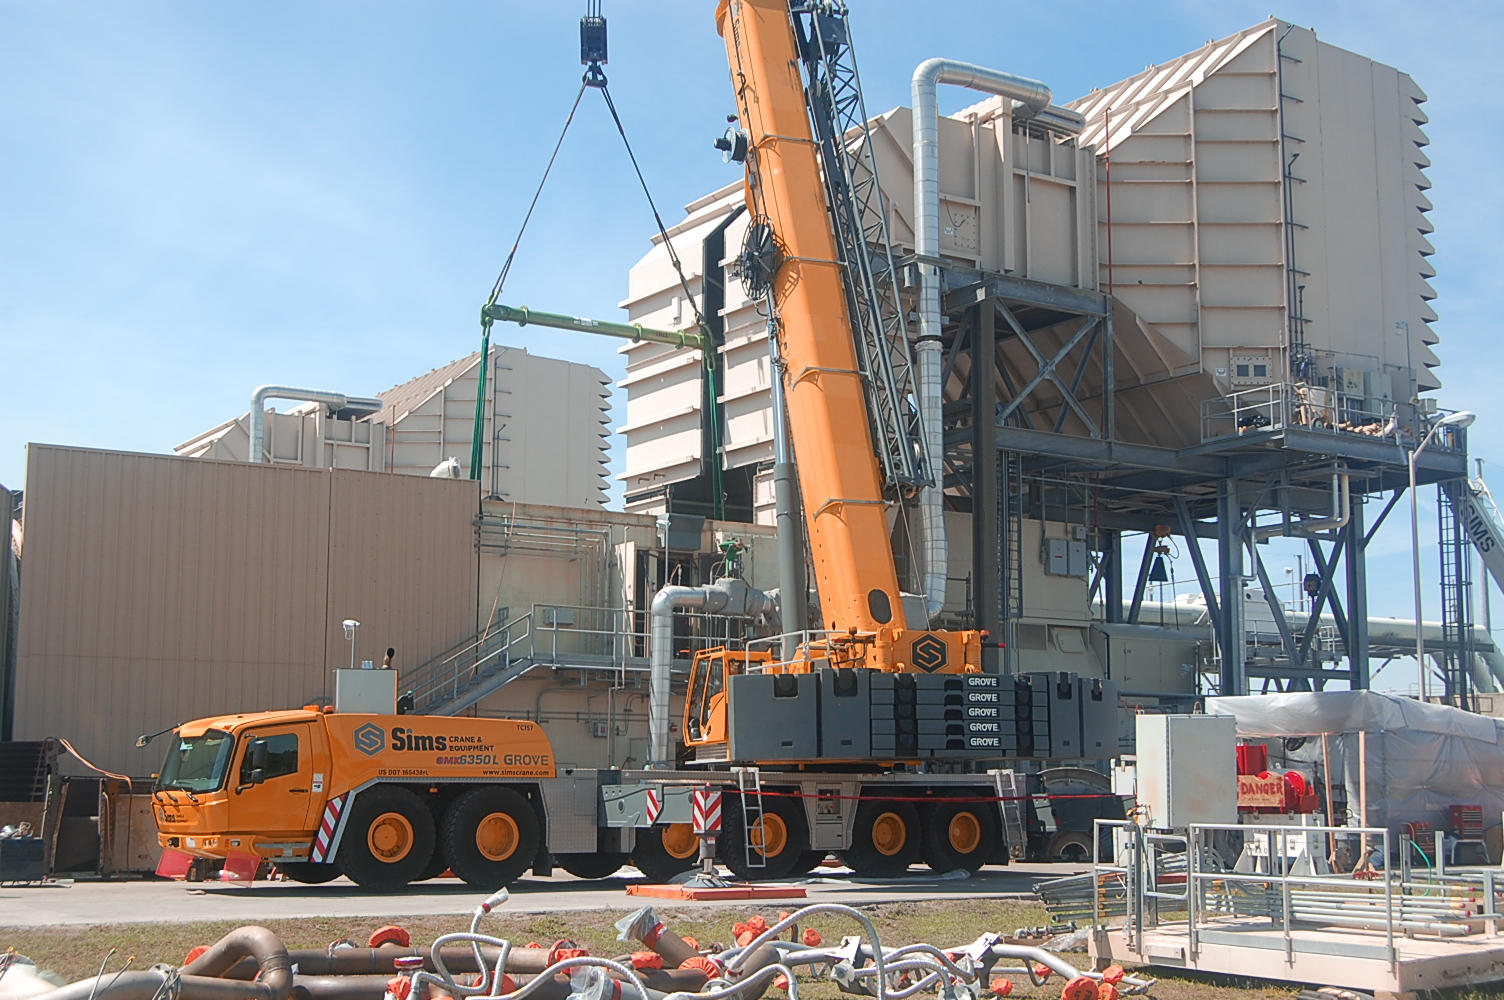 Sims Crane & Equipment Co. image 10